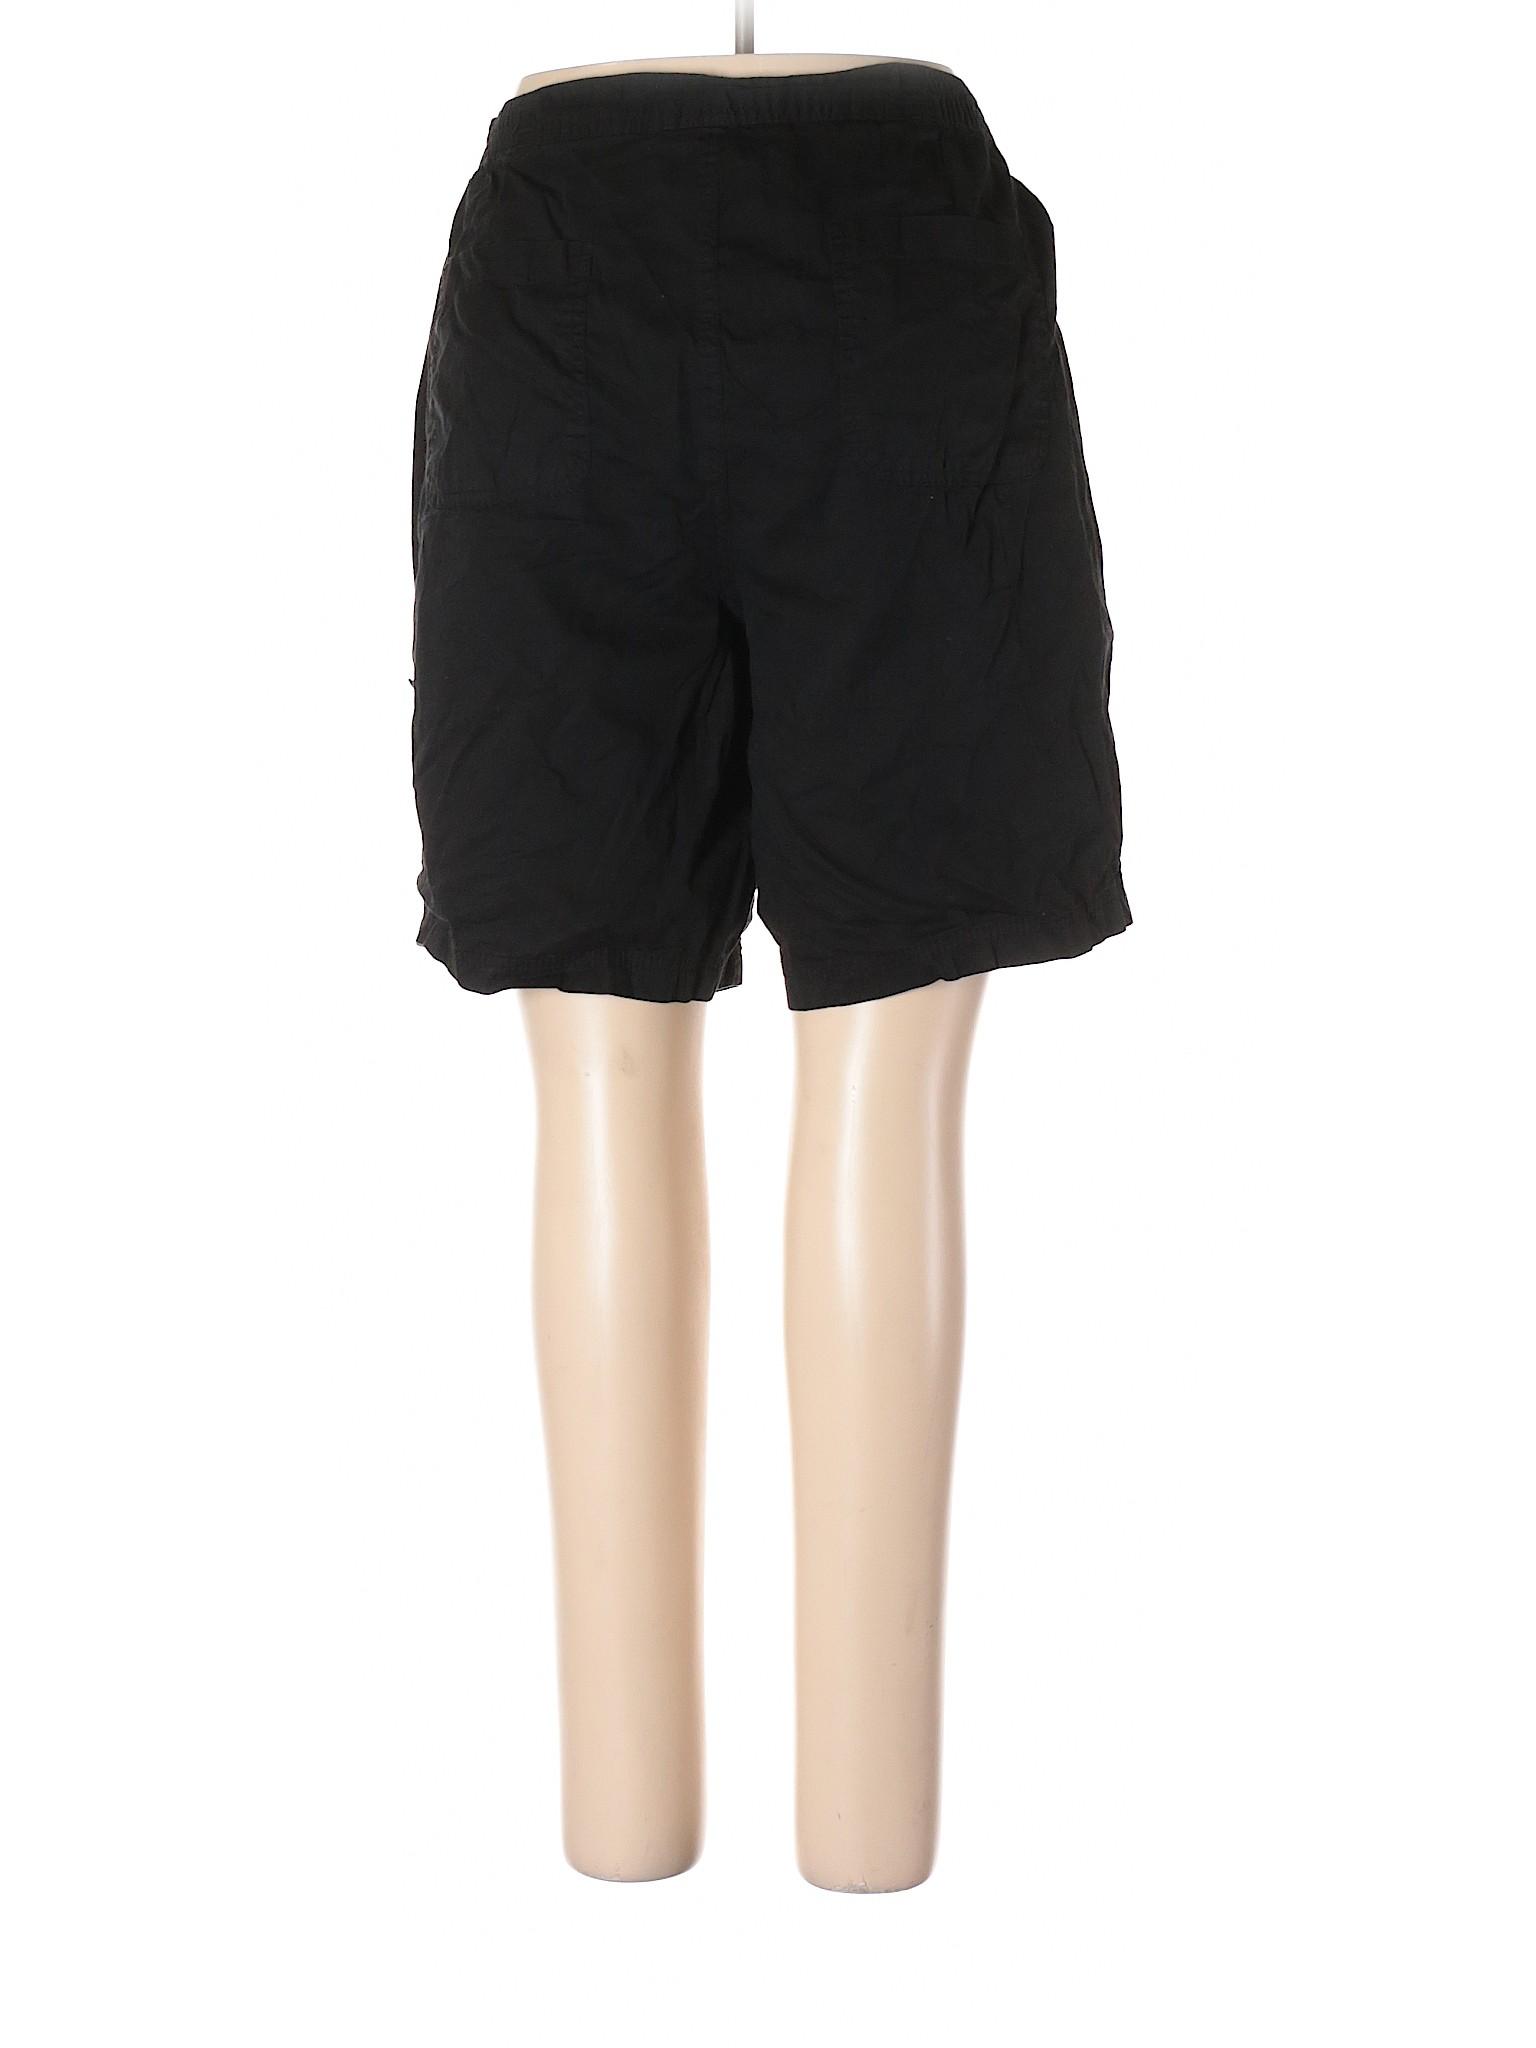 Boutique Shorts Cargo Boutique Faded Faded Glory 5Rw0Xa